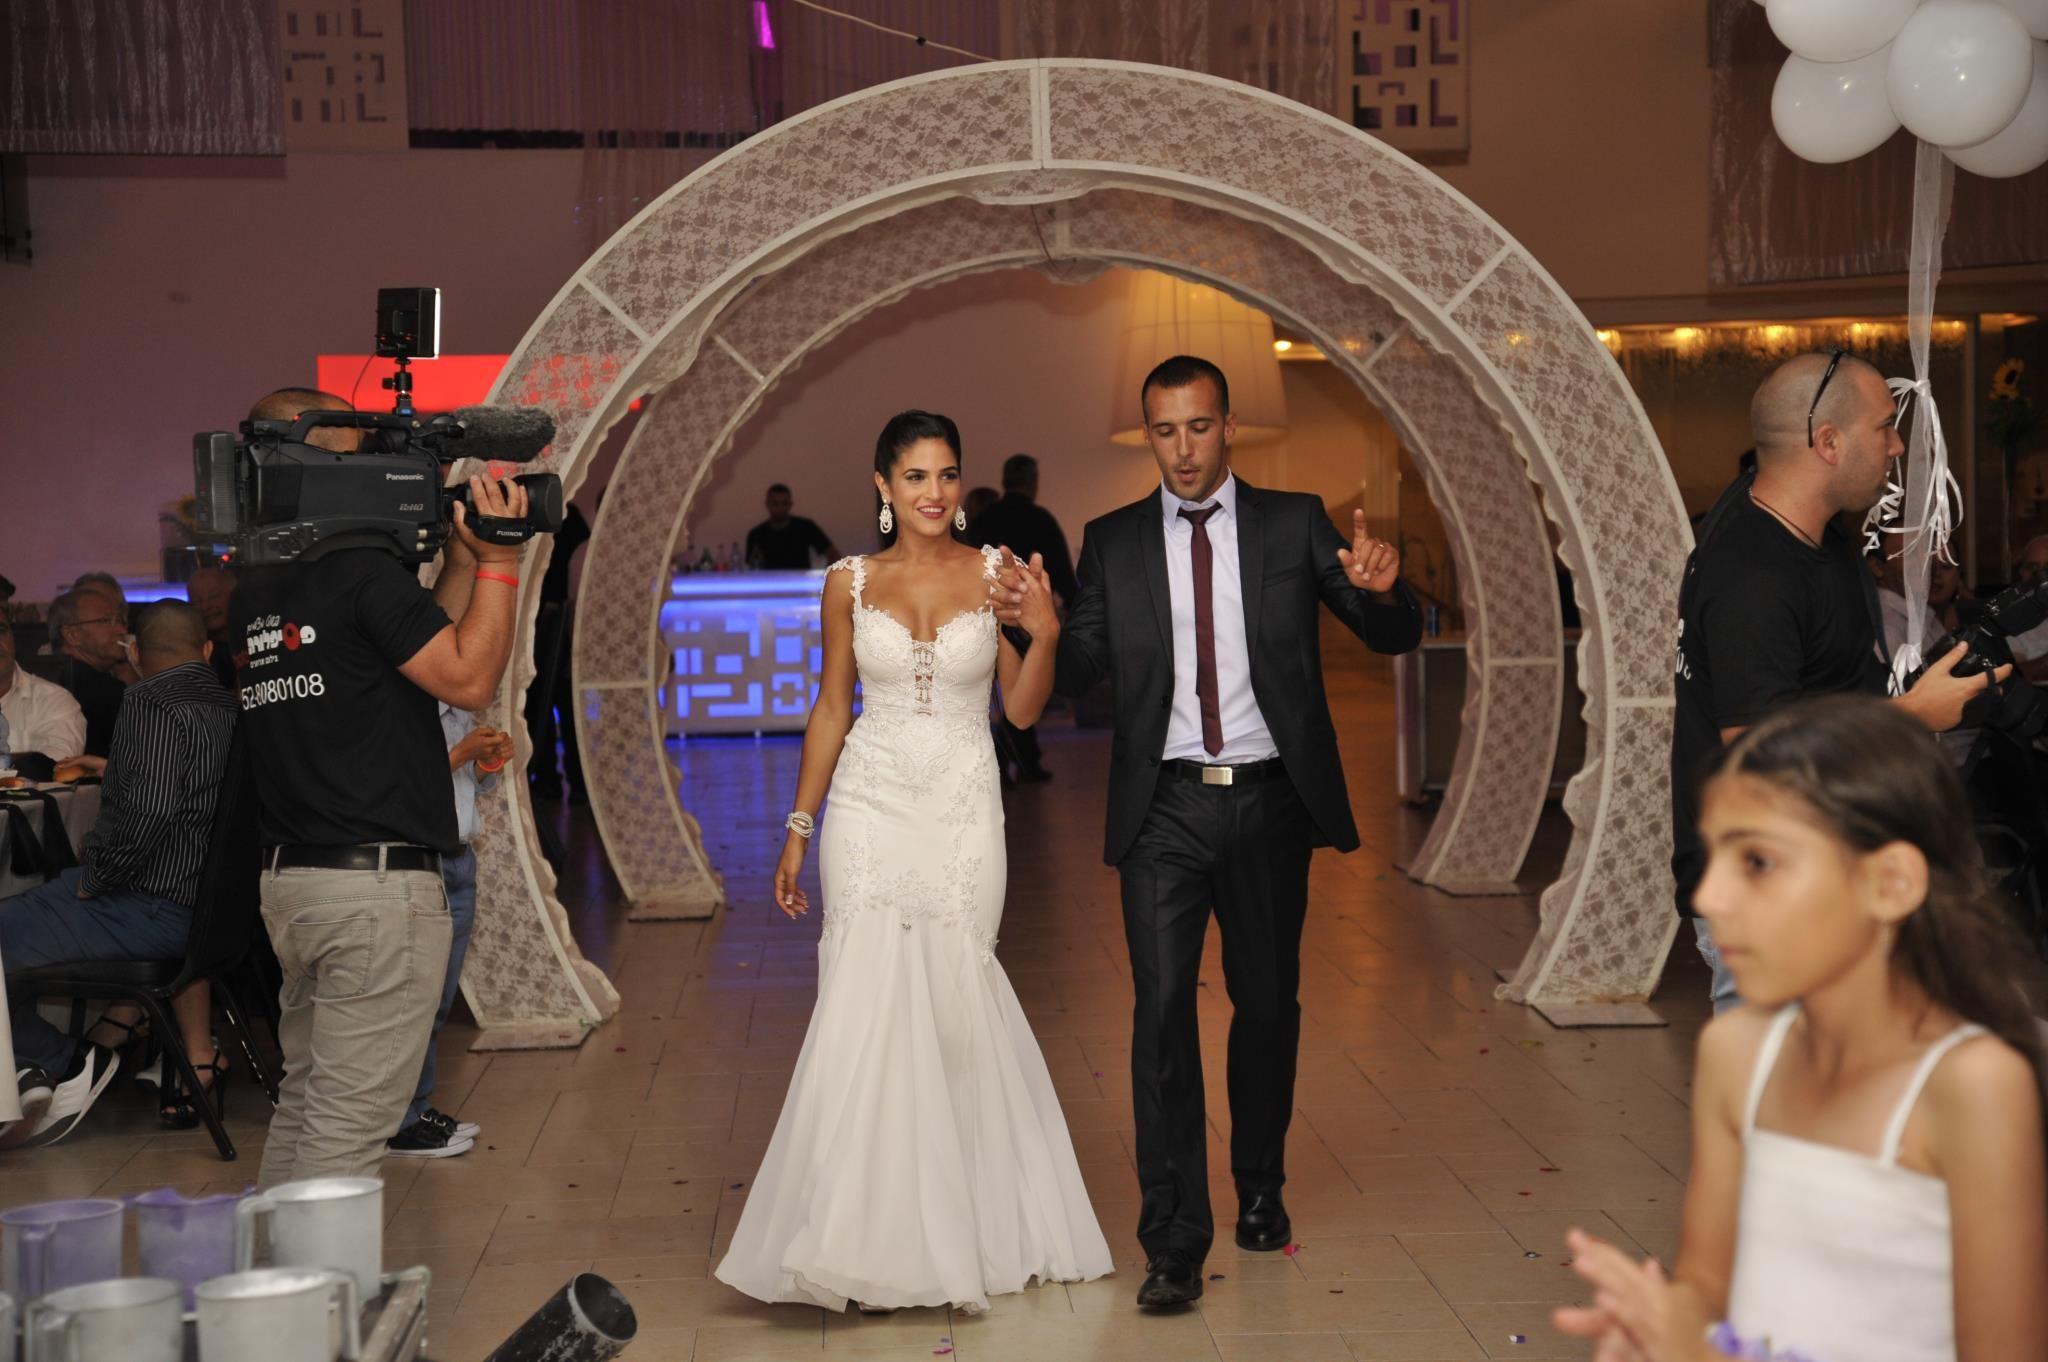 Ronald joyce lace wedding dress september 2018 עמנואל  רעיונות לשמלה  Pinterest